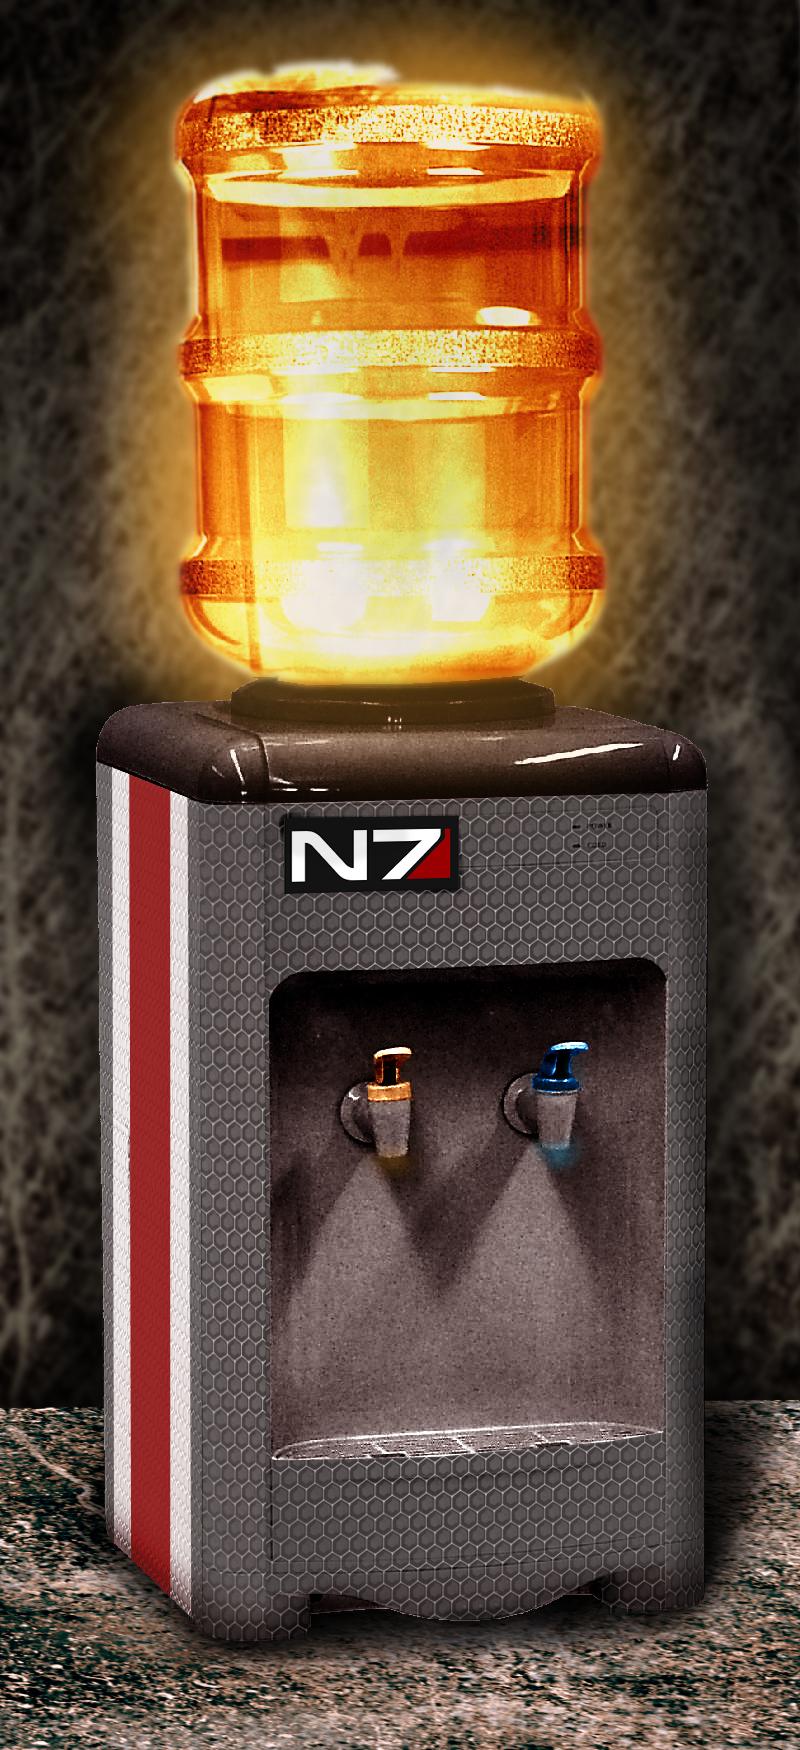 n7_water_dispenser_by_beezqp2-d5xwjni.jpg